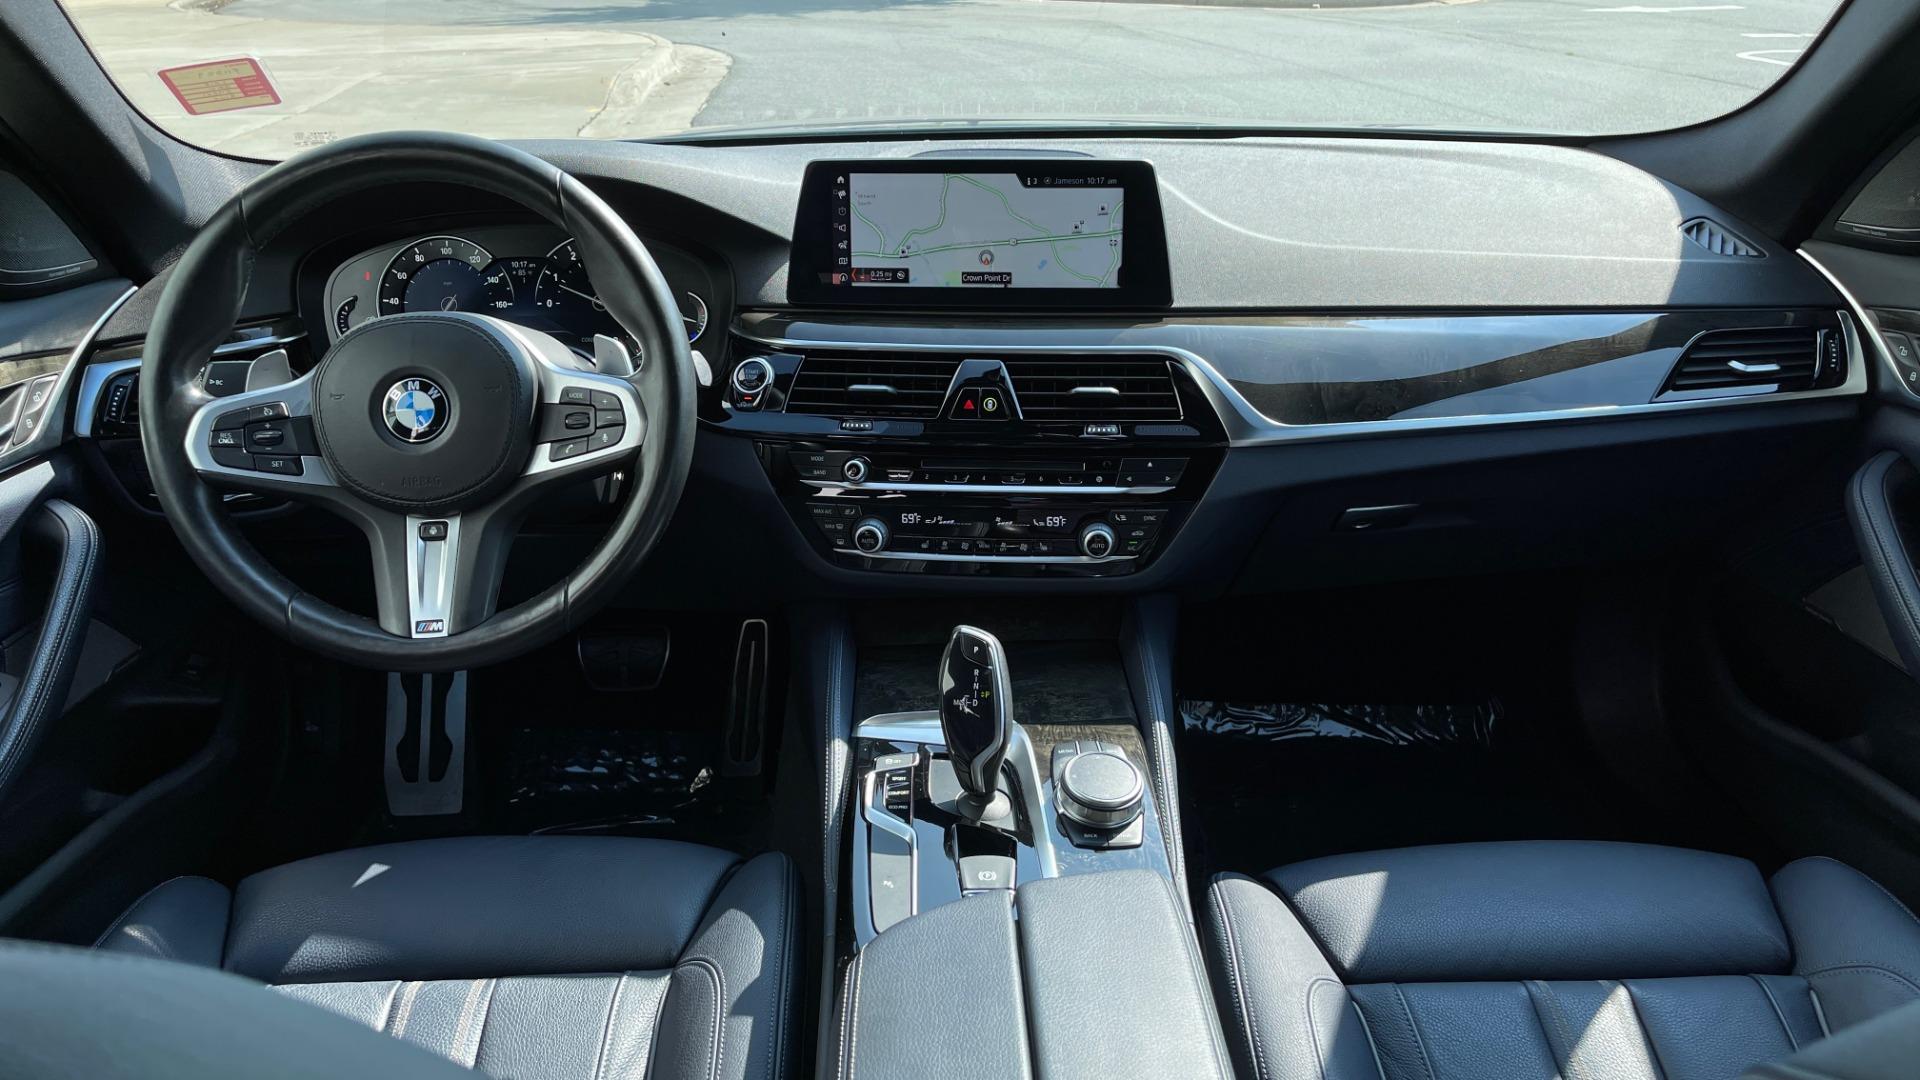 Used 2018 BMW 5 SERIES 540I XDRIVE M-SPORT / DRVR ASST / PDC / APPLE / HUD / H/K SND for sale $42,795 at Formula Imports in Charlotte NC 28227 56